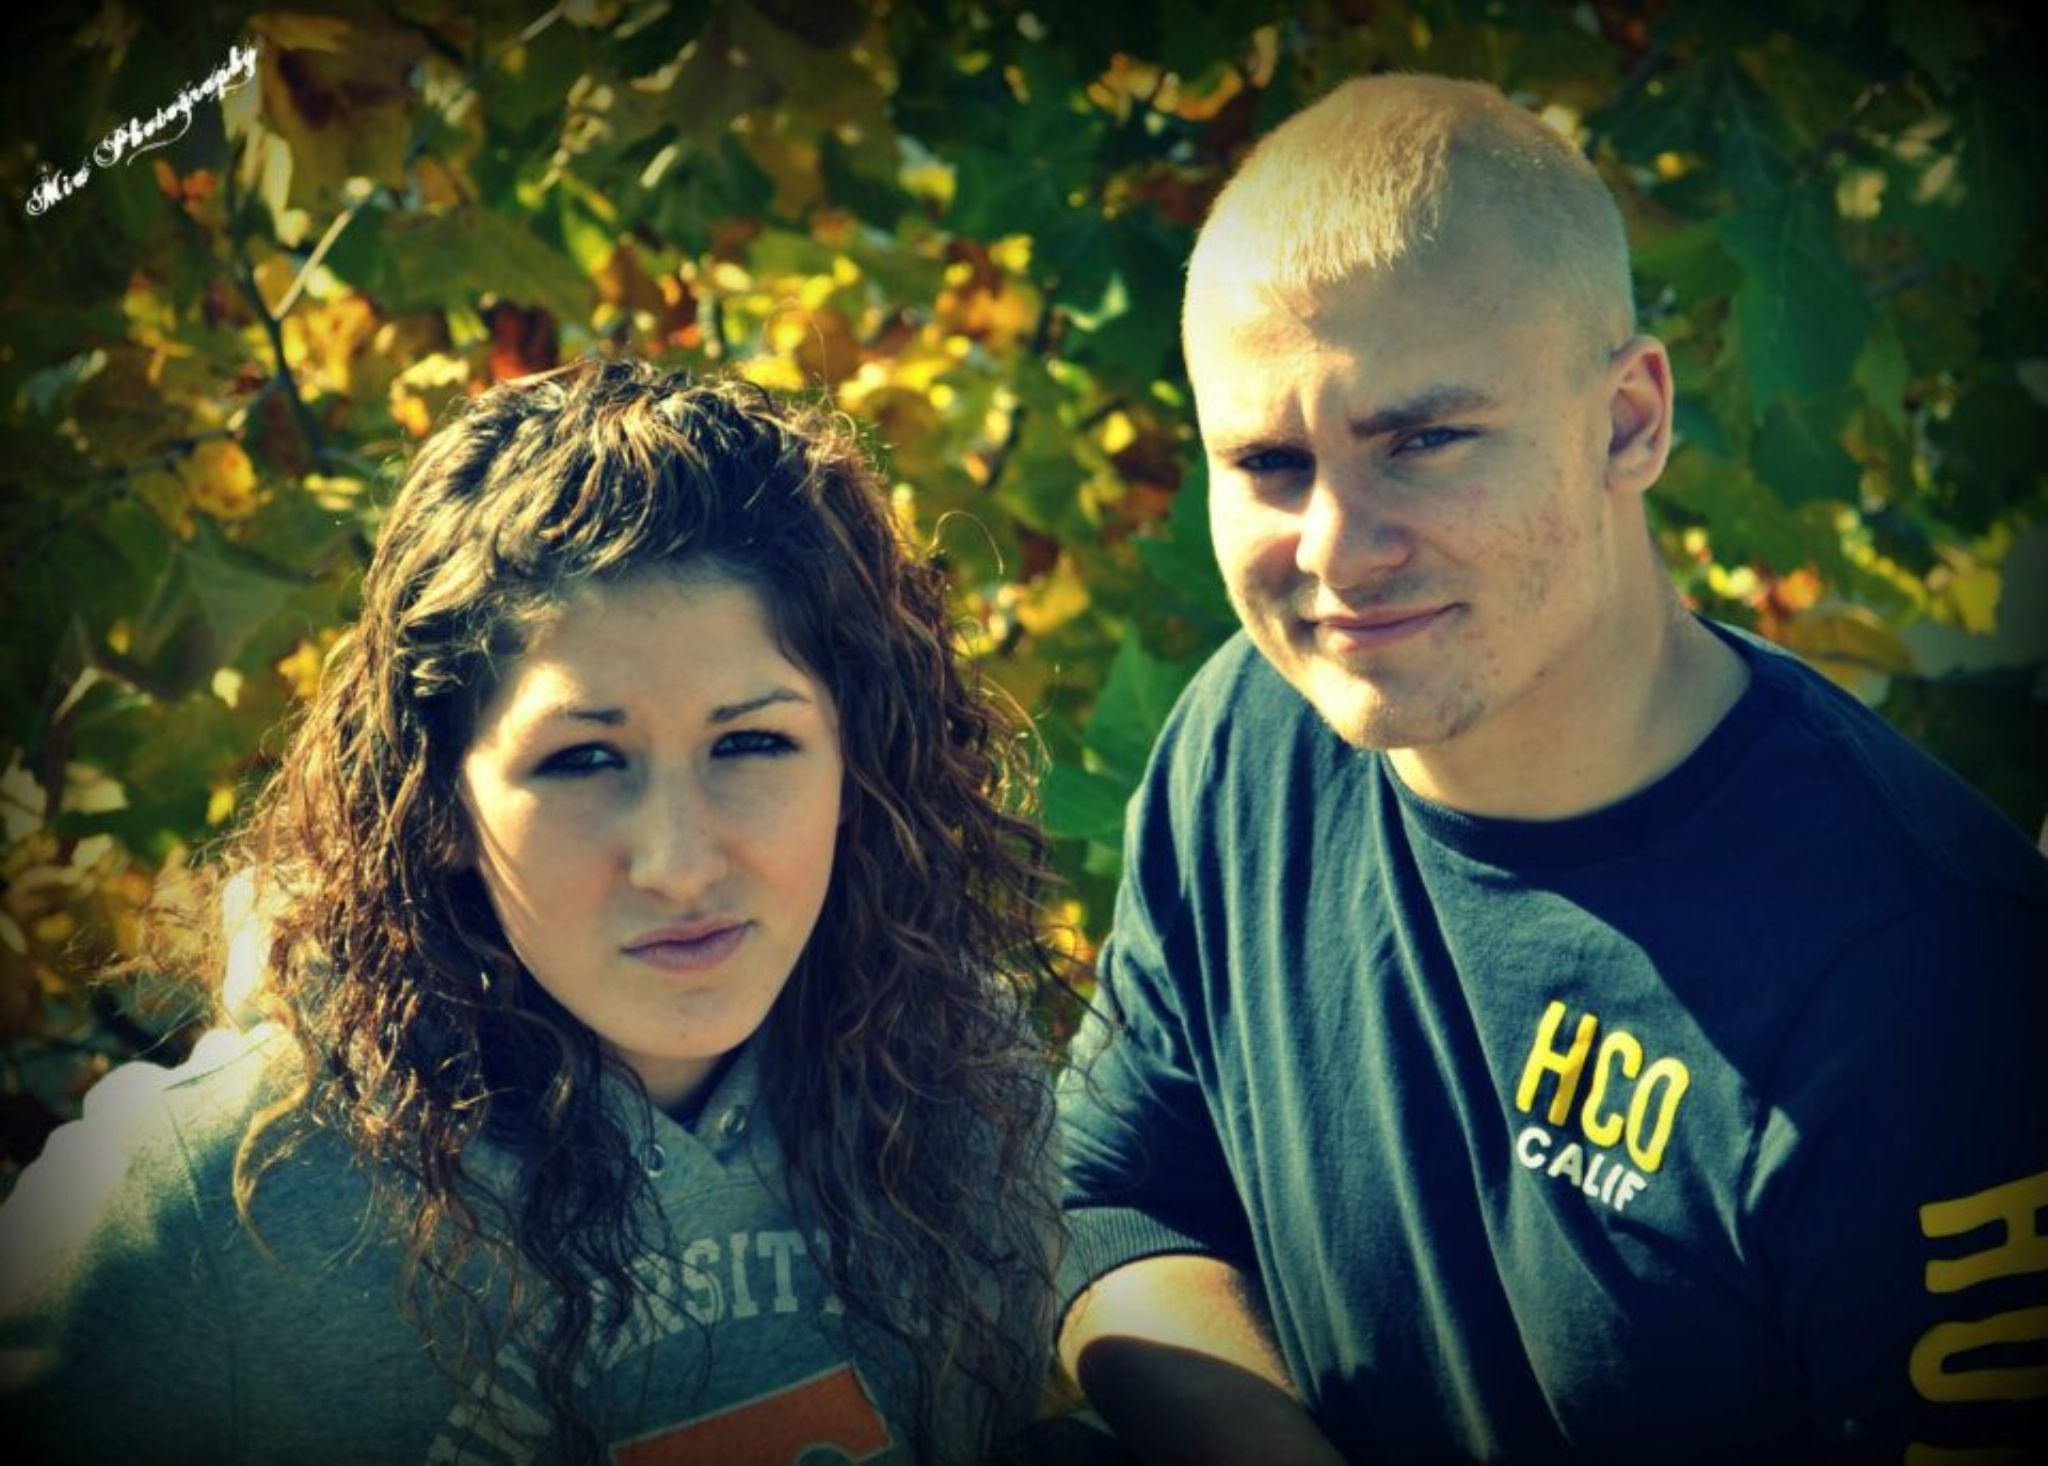 Kaylee and Brady by Tat2dGoddess